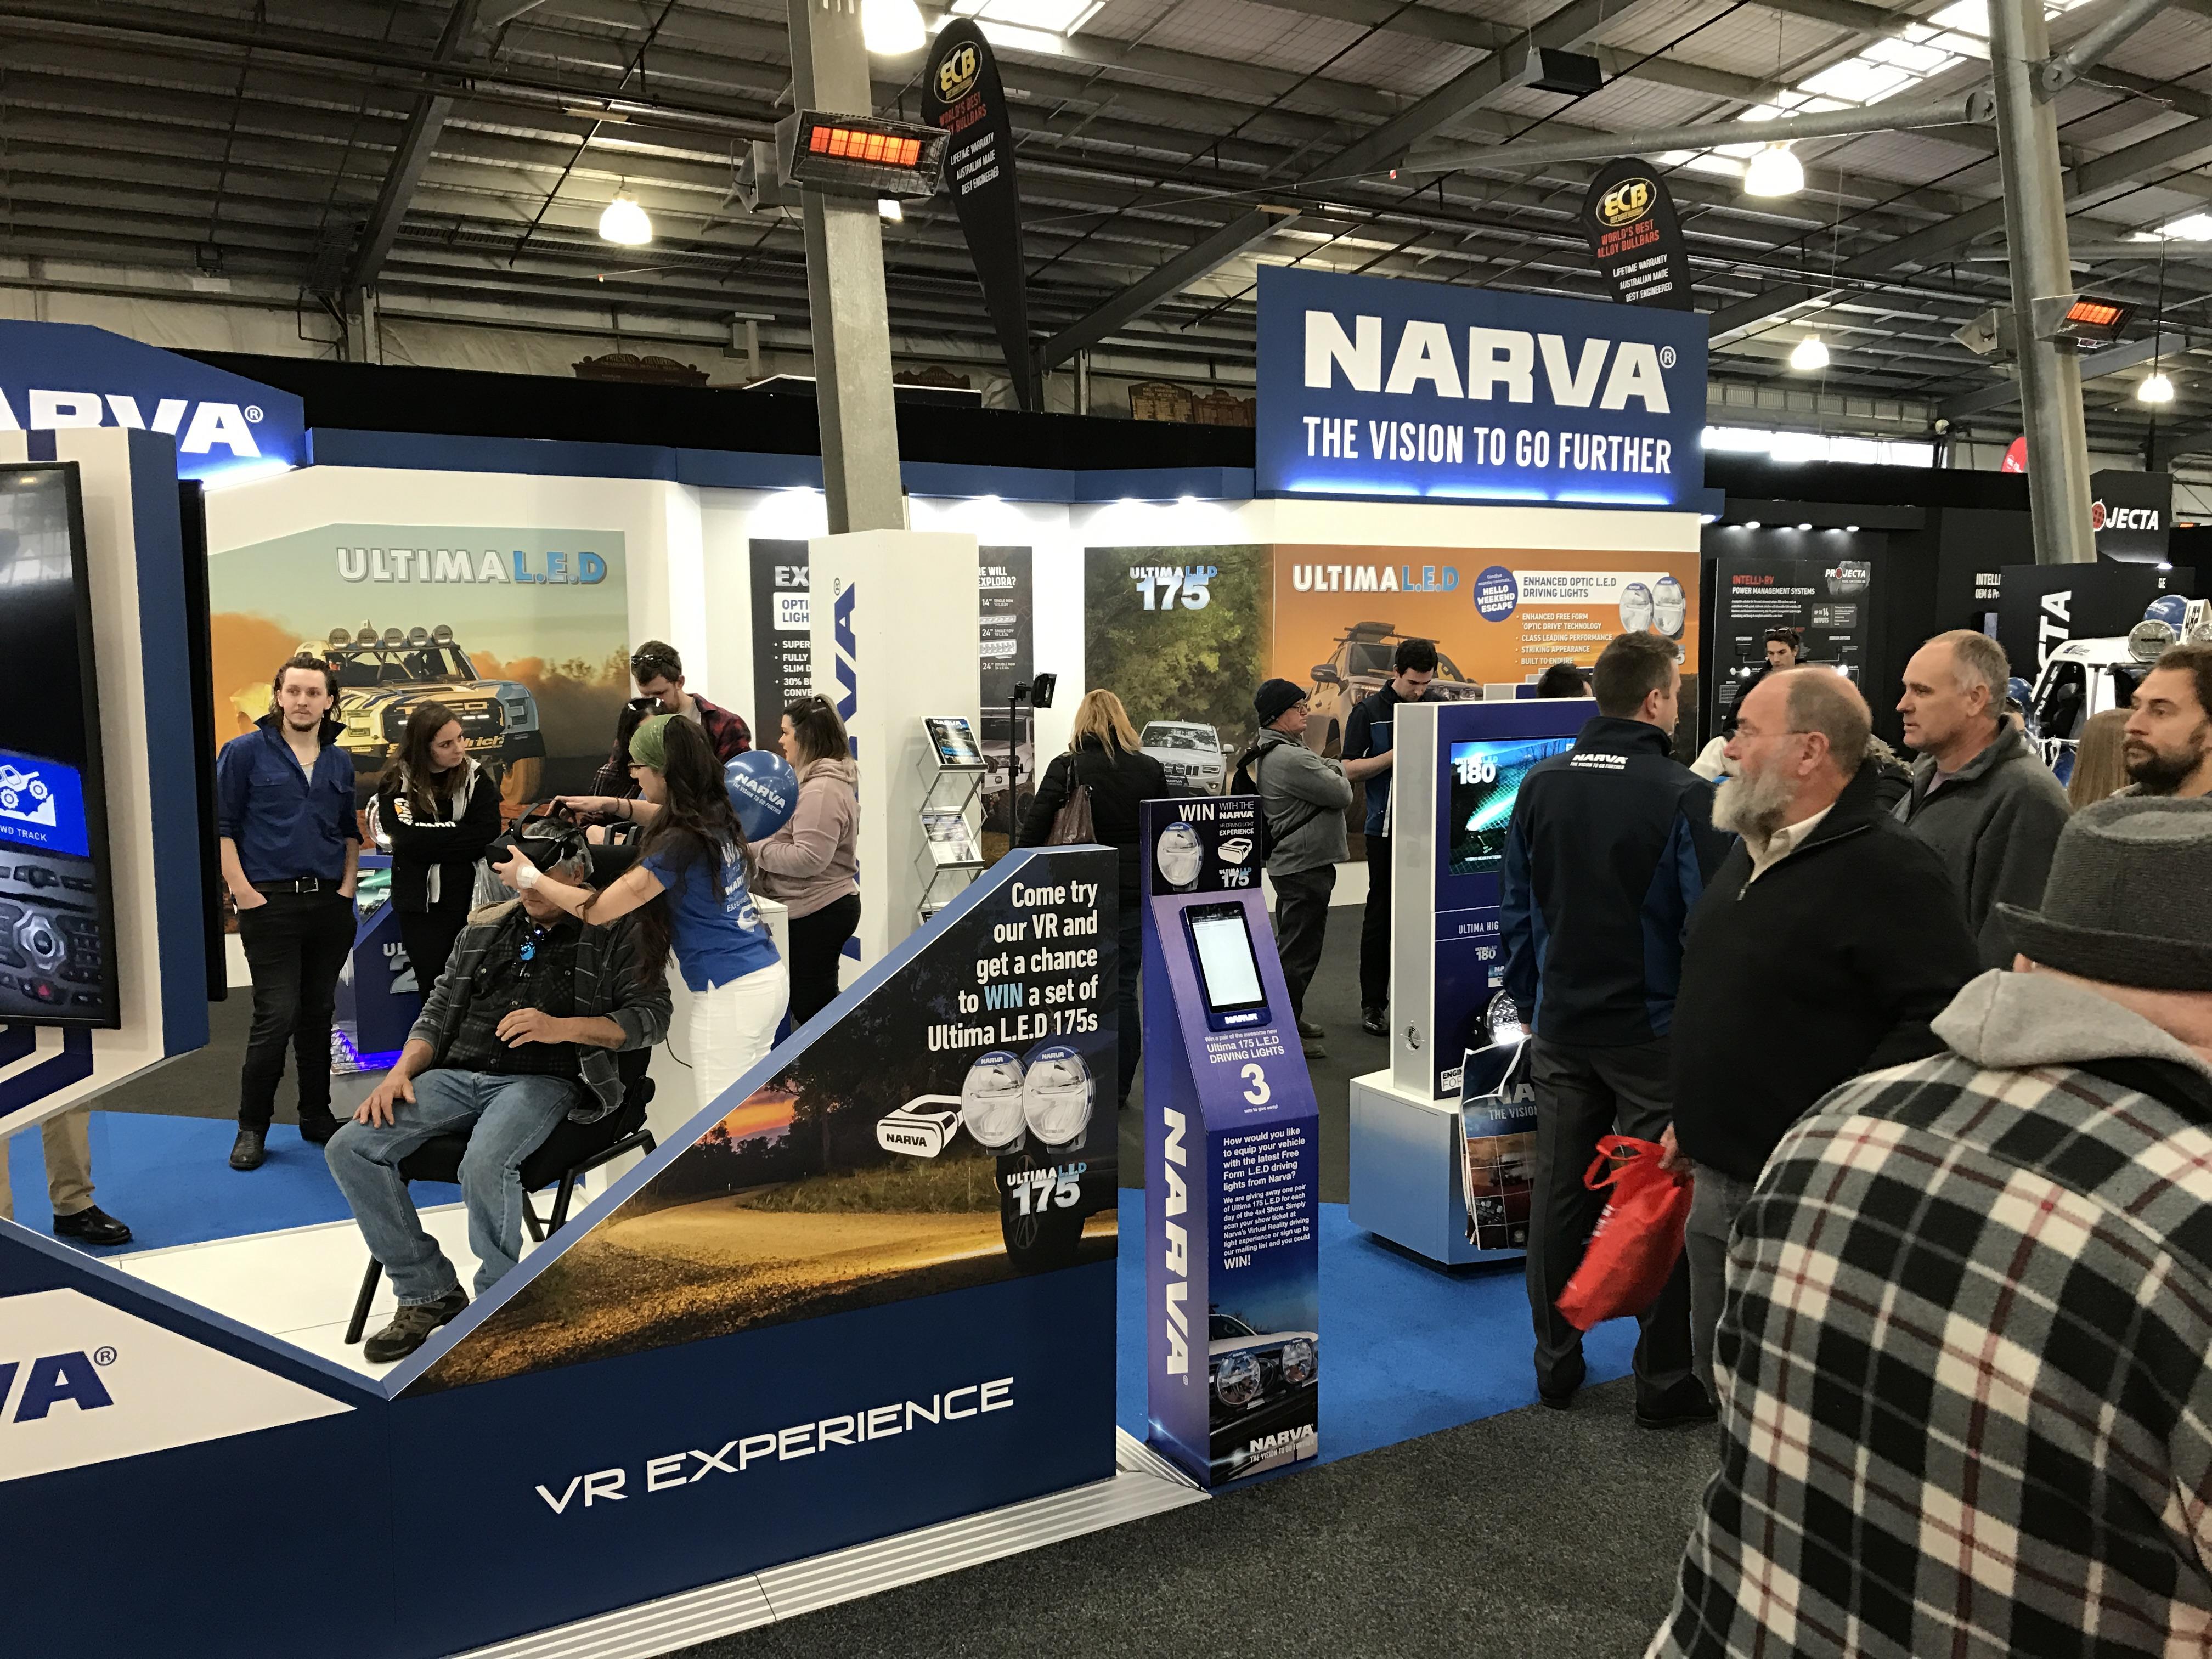 Narva's Virtual Reality Experience Wins Big!